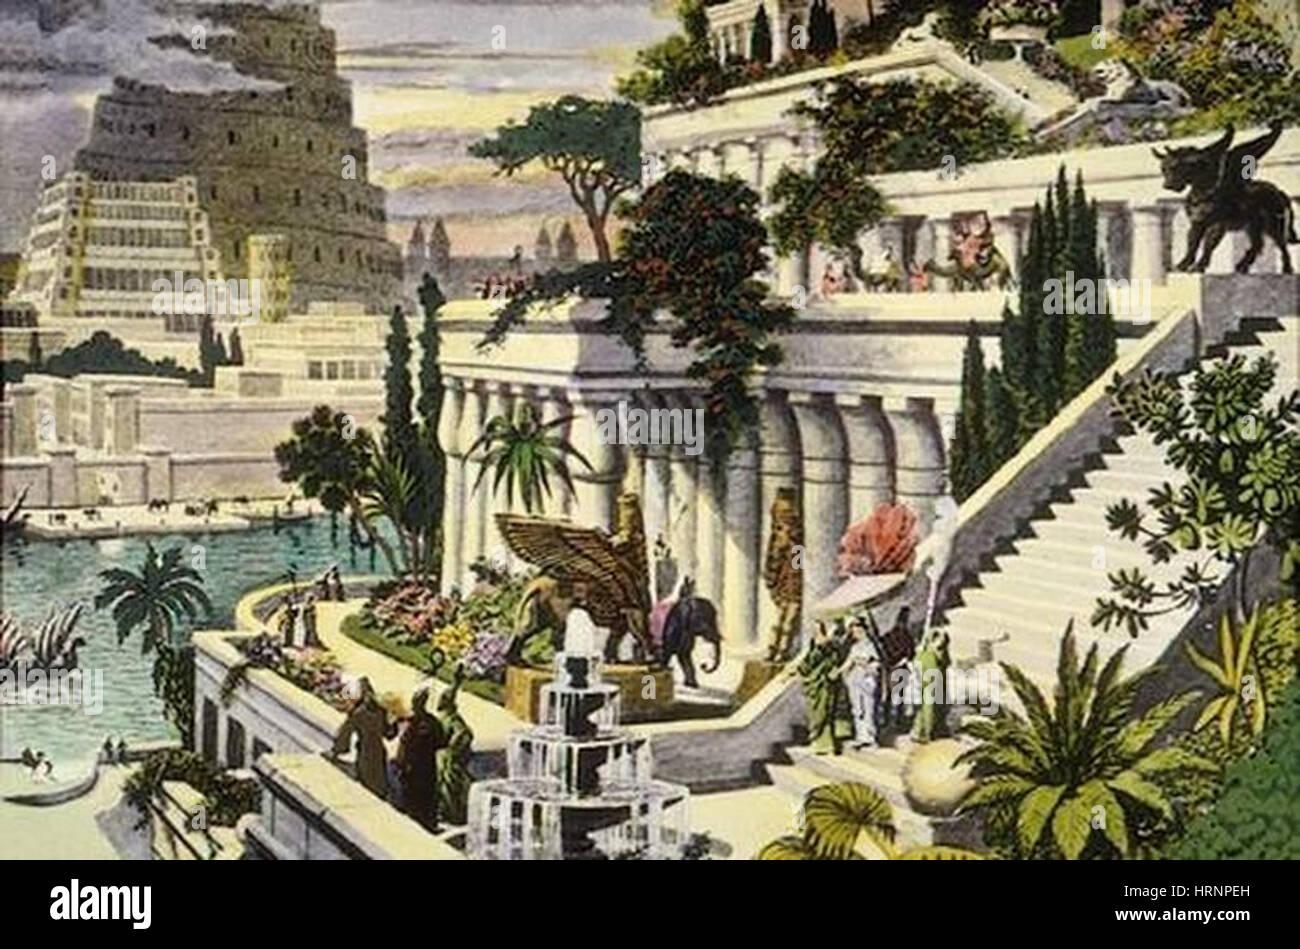 Ancient Wonder of the World, Gardens of Babylon Stock Photo